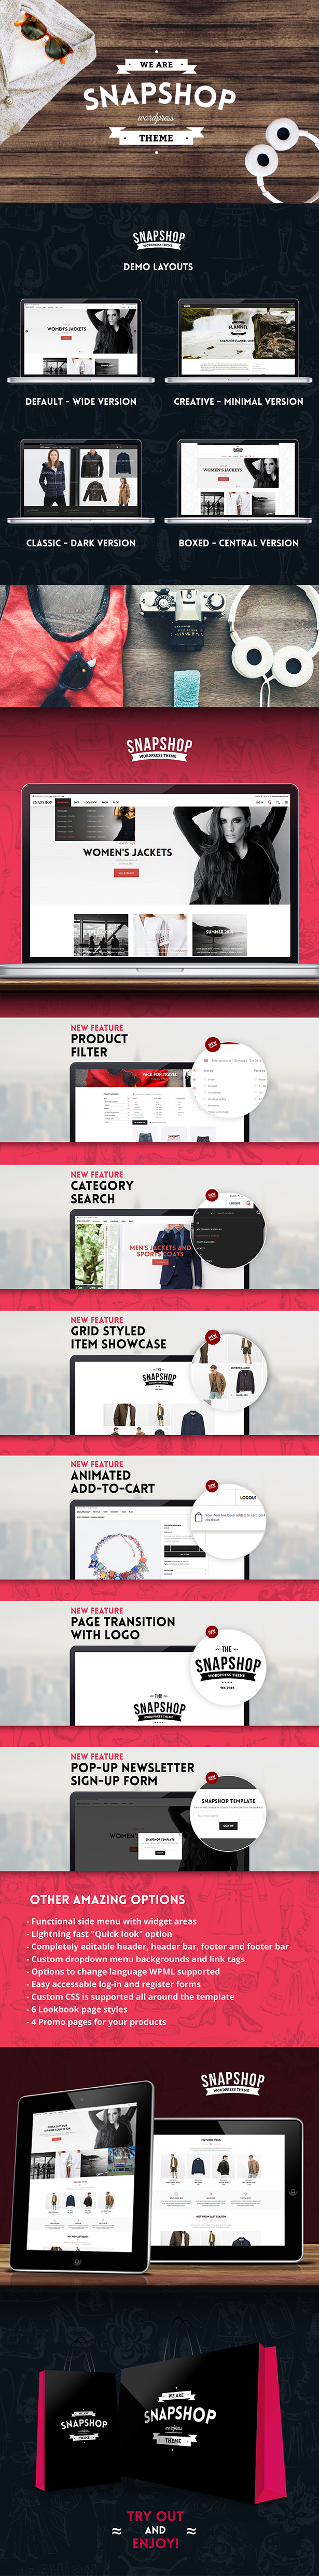 snapshop3 - Snapshop - Responsive WooCommerce Wordpress Theme - Enhance Your Shop Website